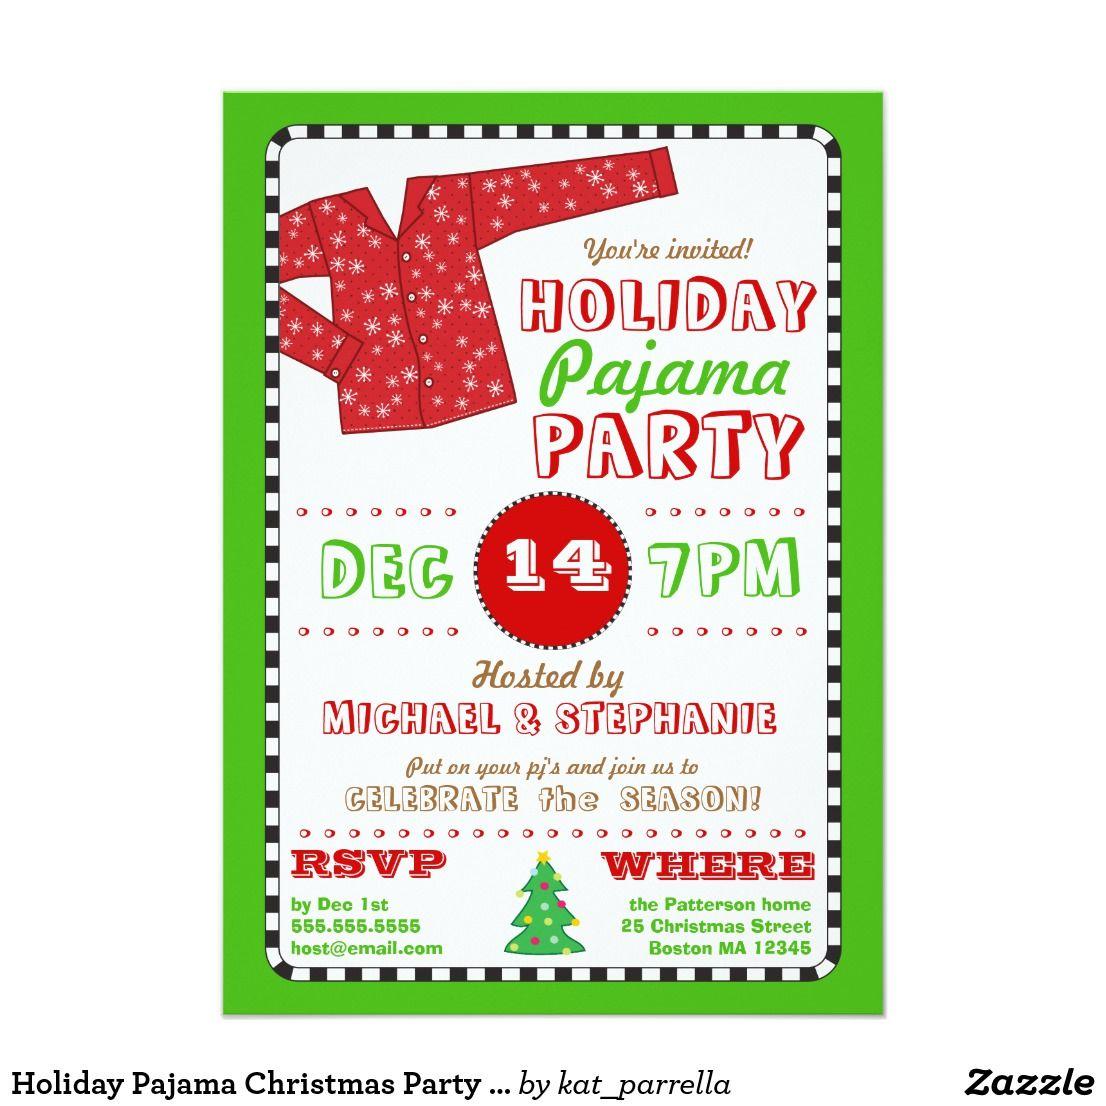 Holiday Pajama Christmas Party Invitation Celebrate the season in ...